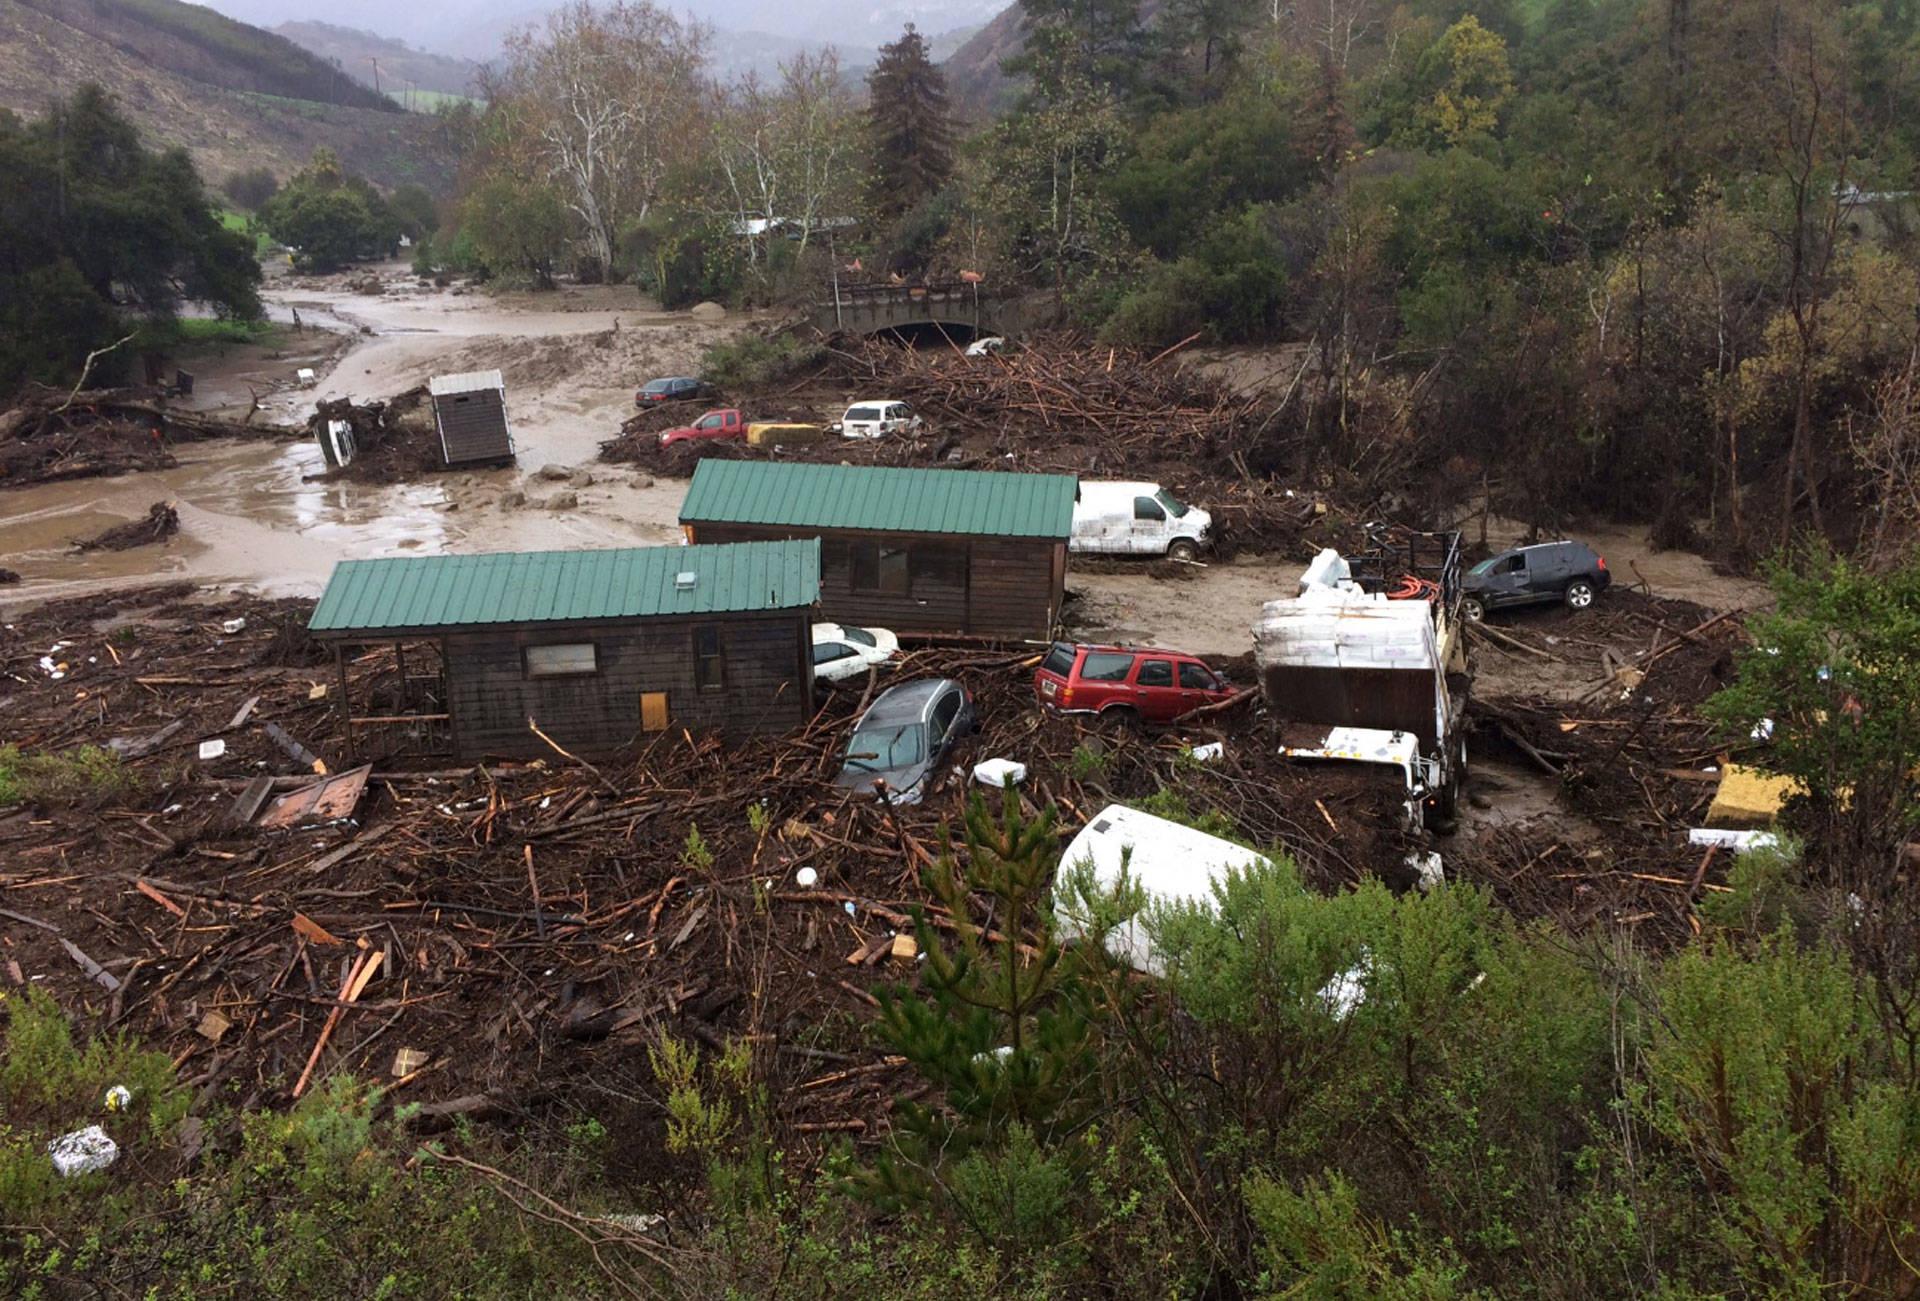 flood sweeps vehicles and cabins down canyon near santa